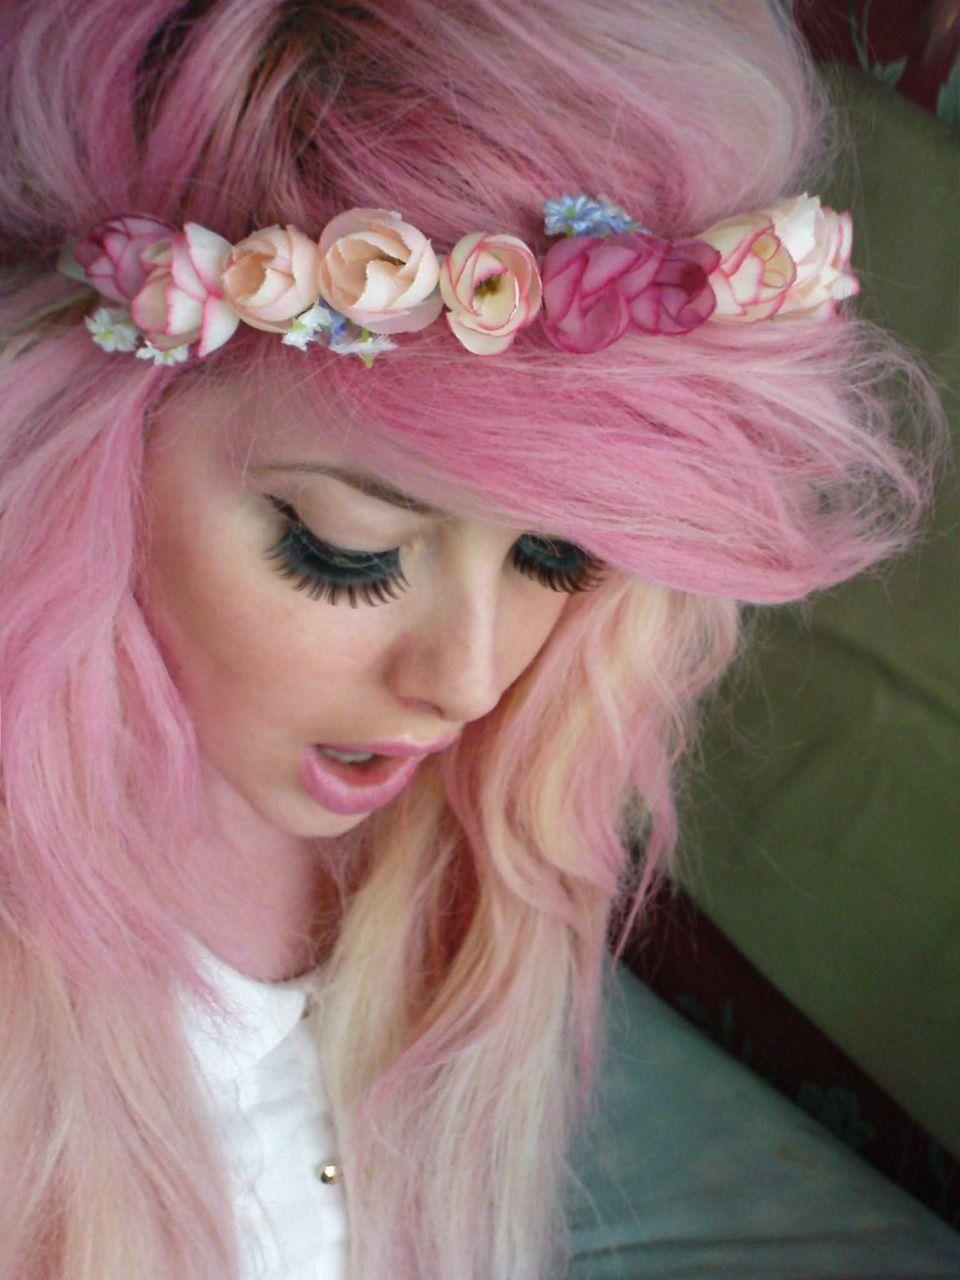 Perhaps this headband for the wedding? | Hairdos & Glam | Pinterest ...